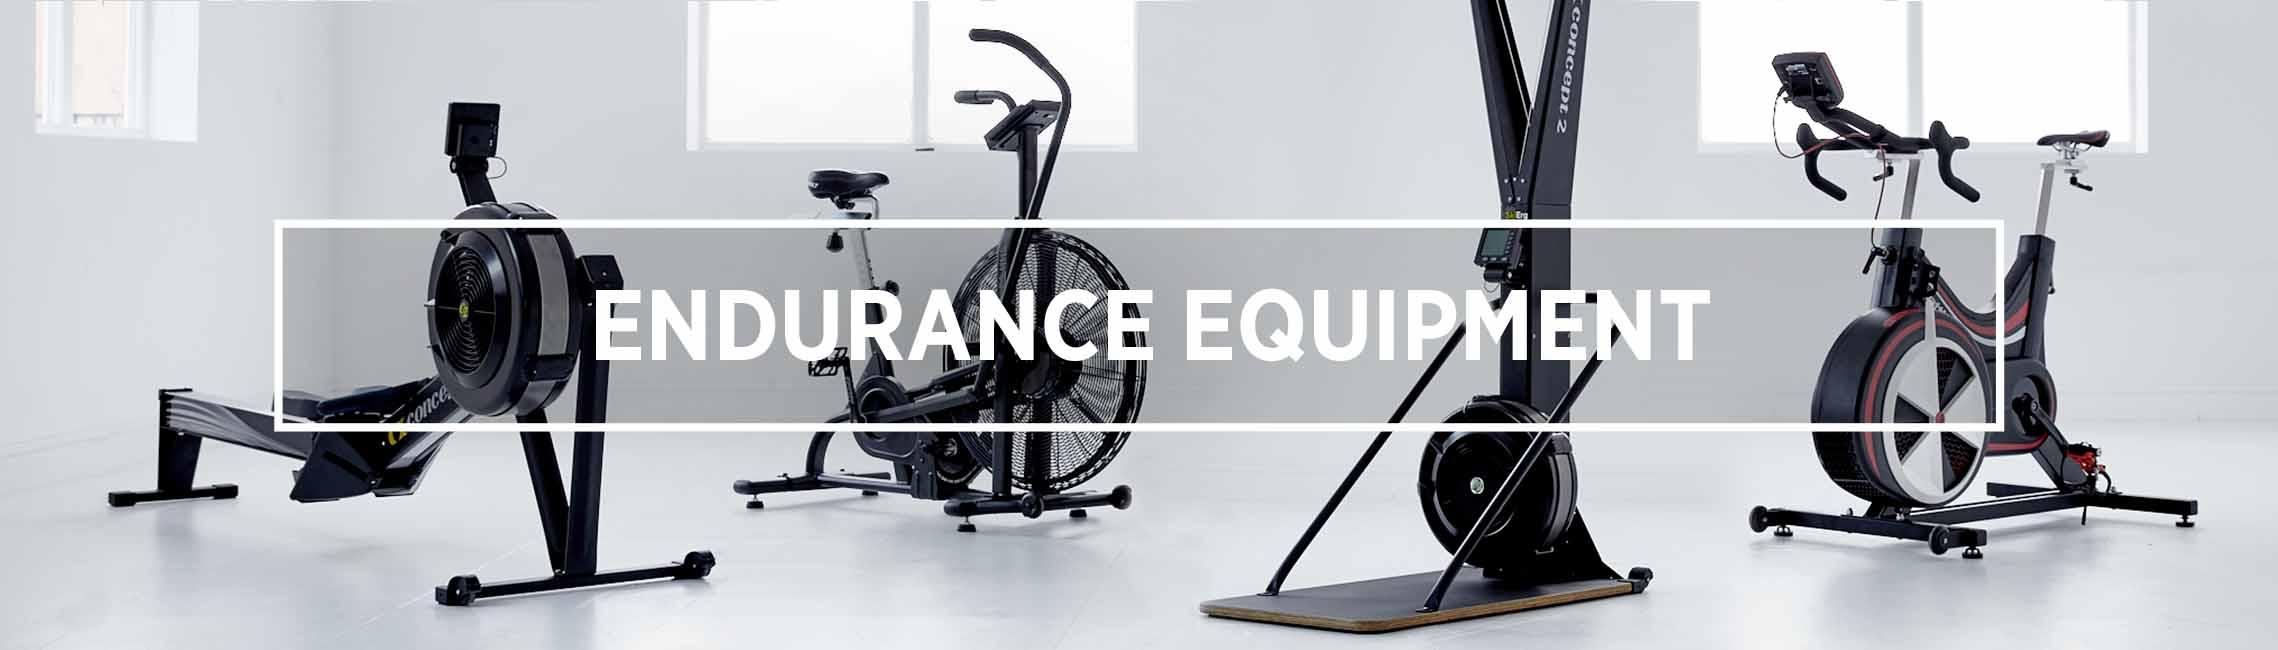 Endurance Equipment